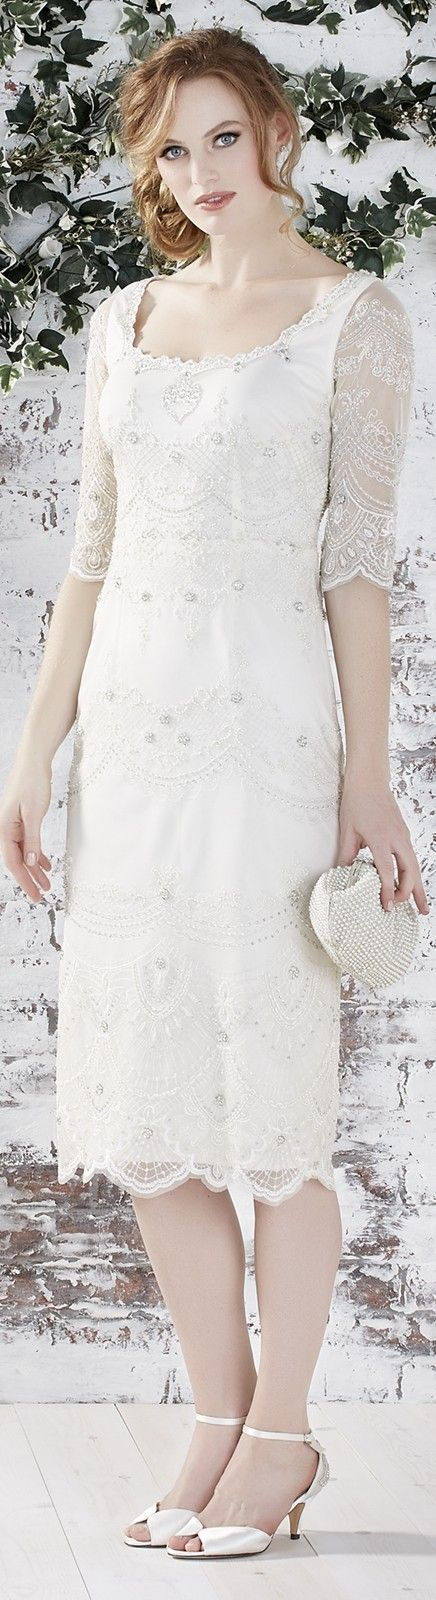 Garden Wedding Dresses For Older Brides : Best second marriage dress ideas on